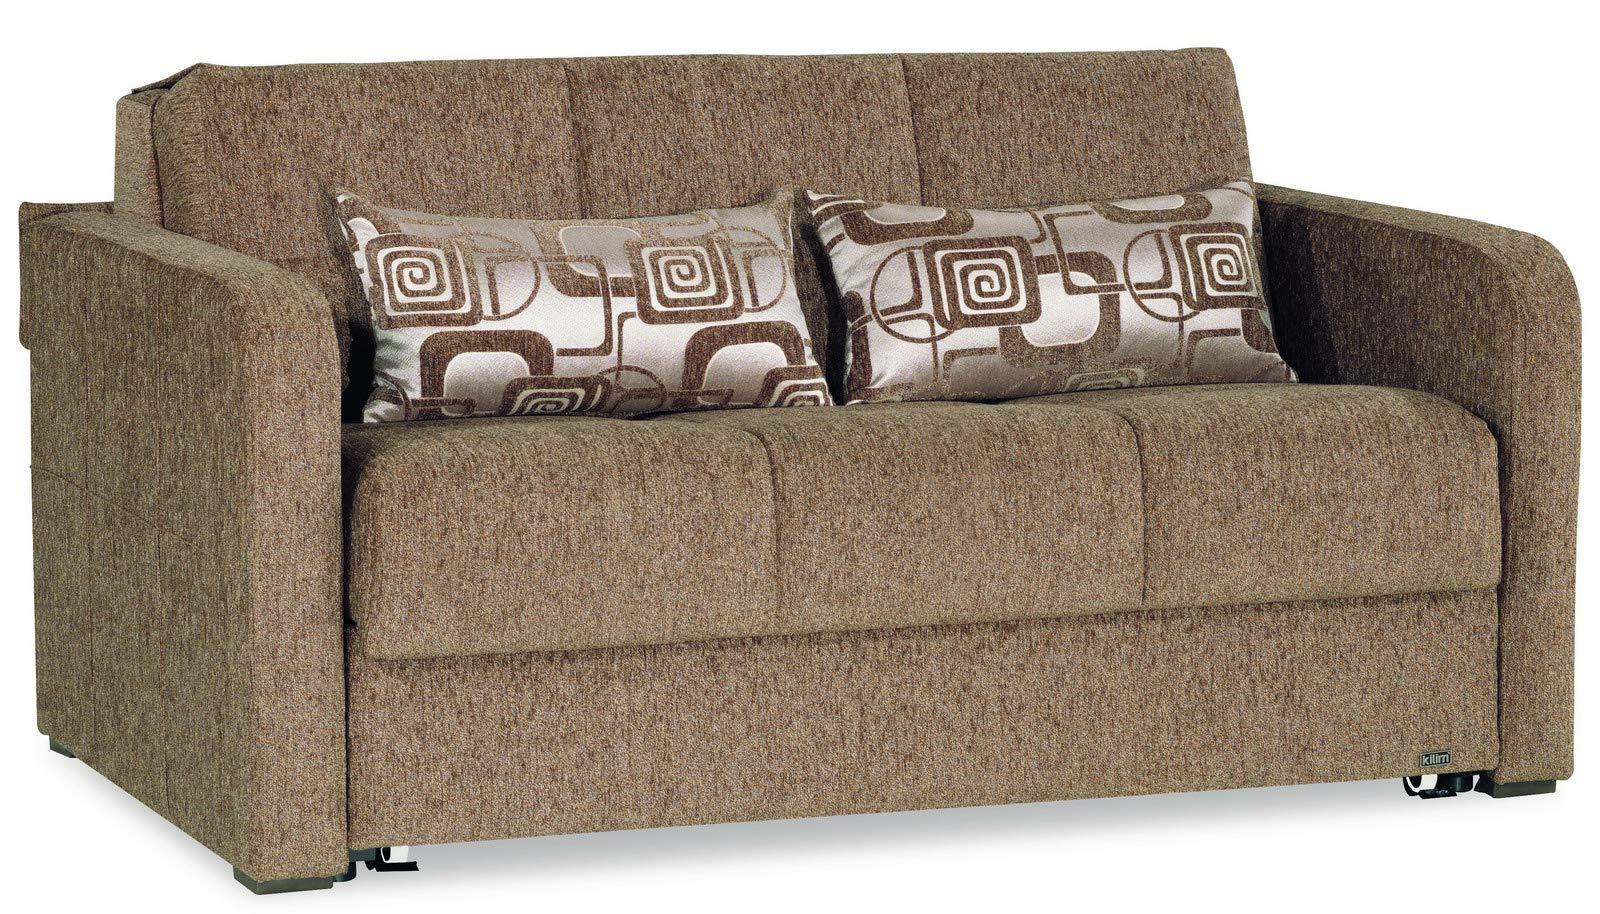 Casamode Ferra Fashion Loveseat Sleeper Brown Fabric Chennile